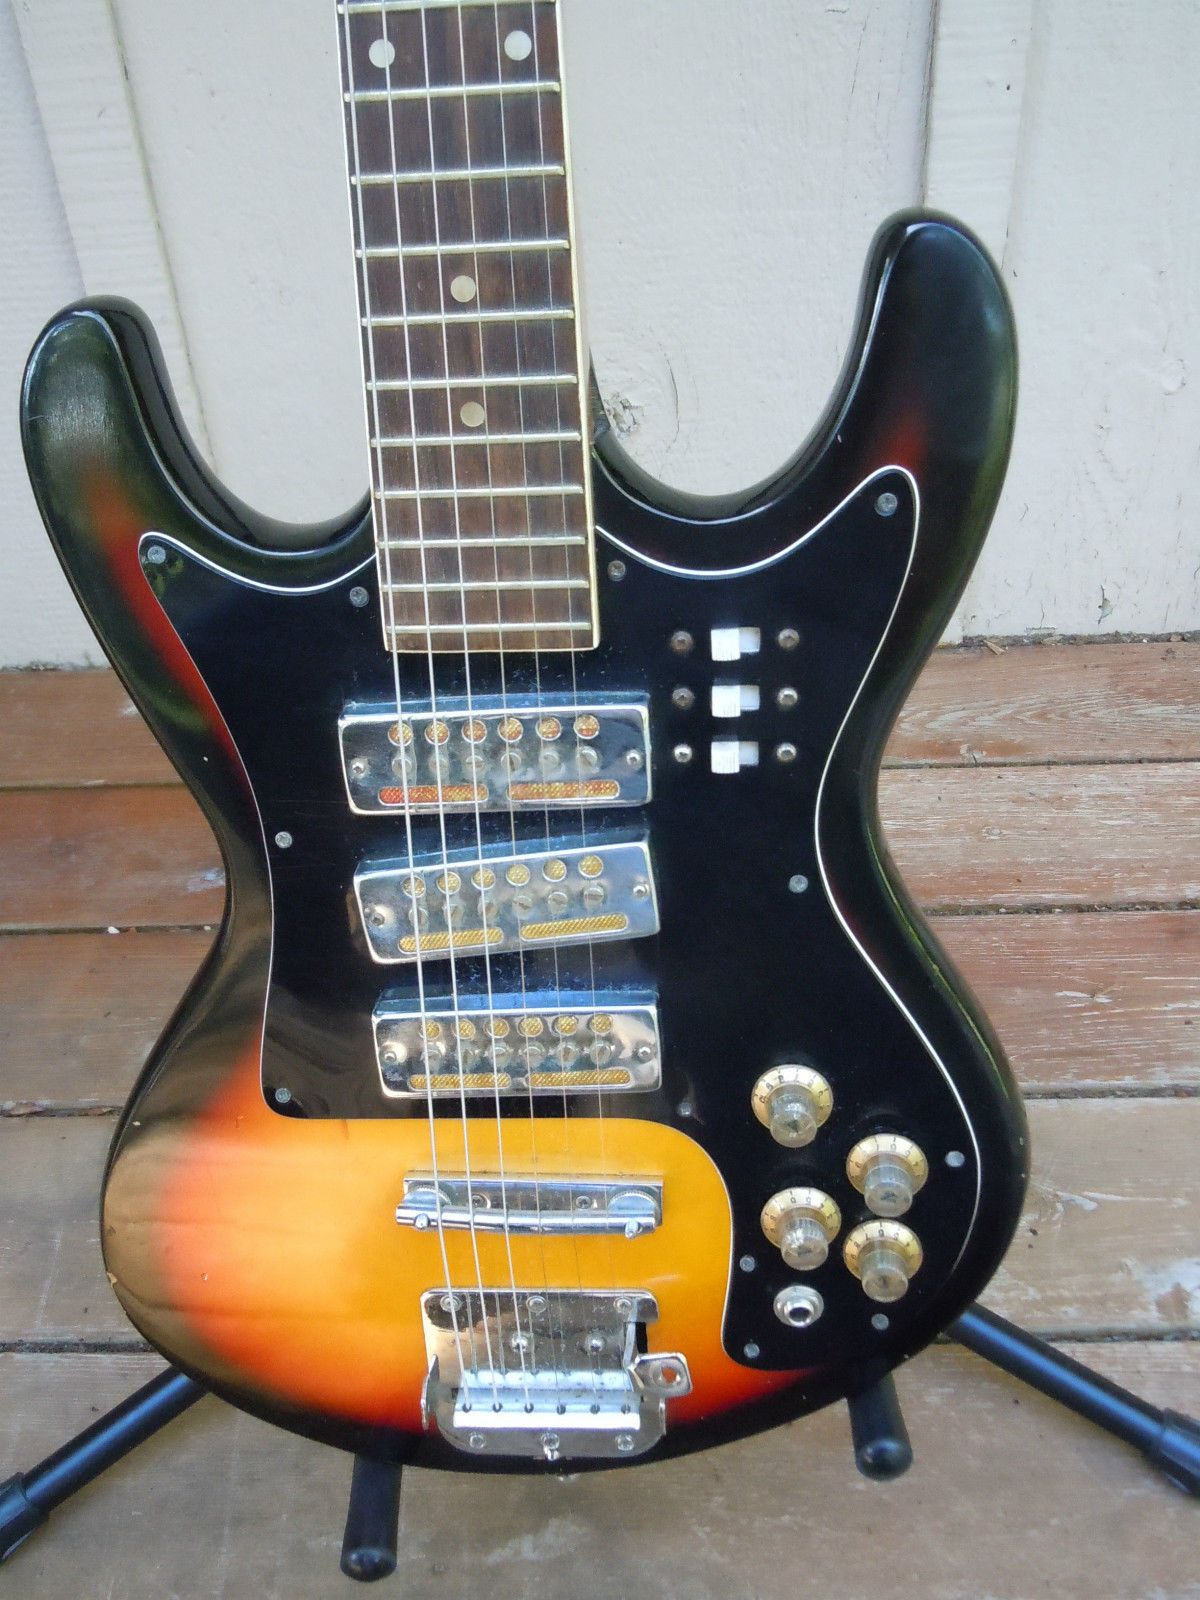 medium resolution of vintage electric japanese guitar teisco kawai kingston similar